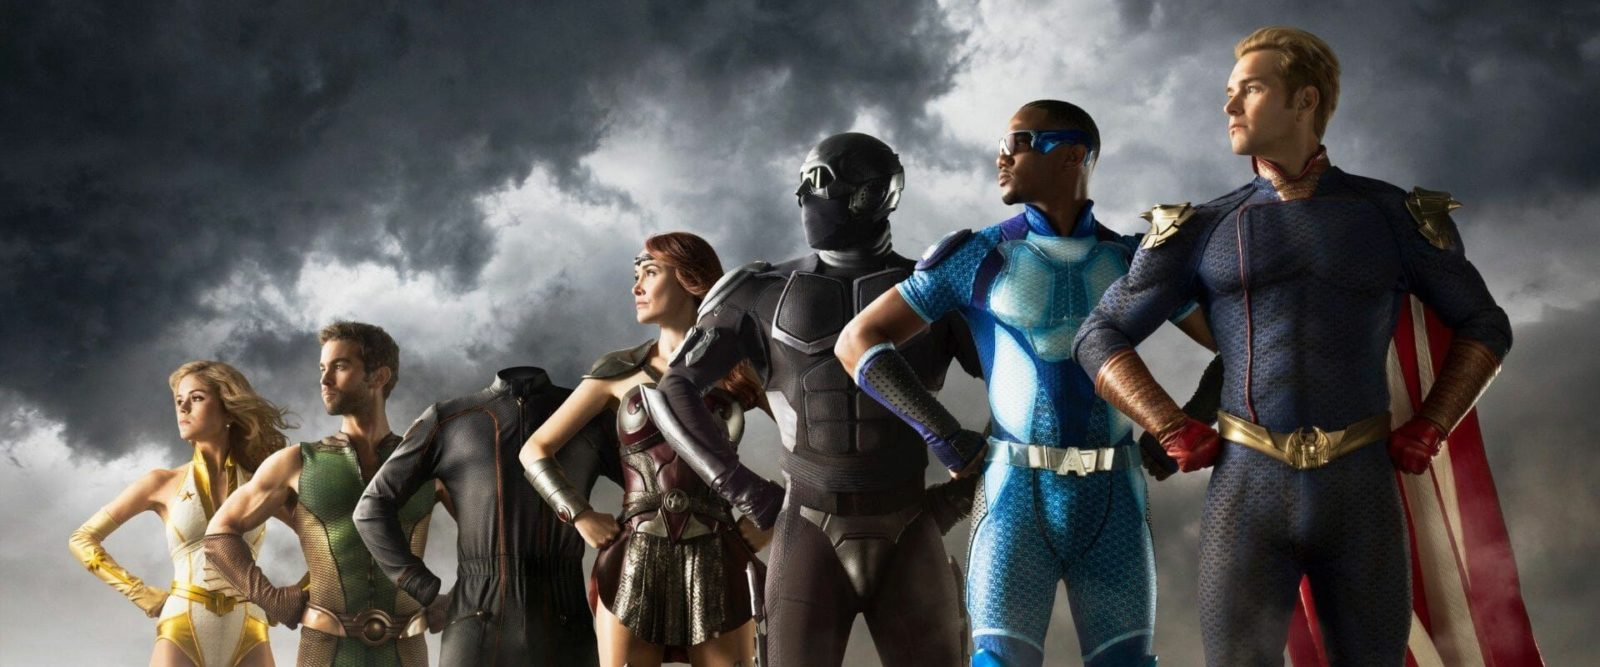 Слухи: сериал «Пацаны» продлён на четвёртый сезон